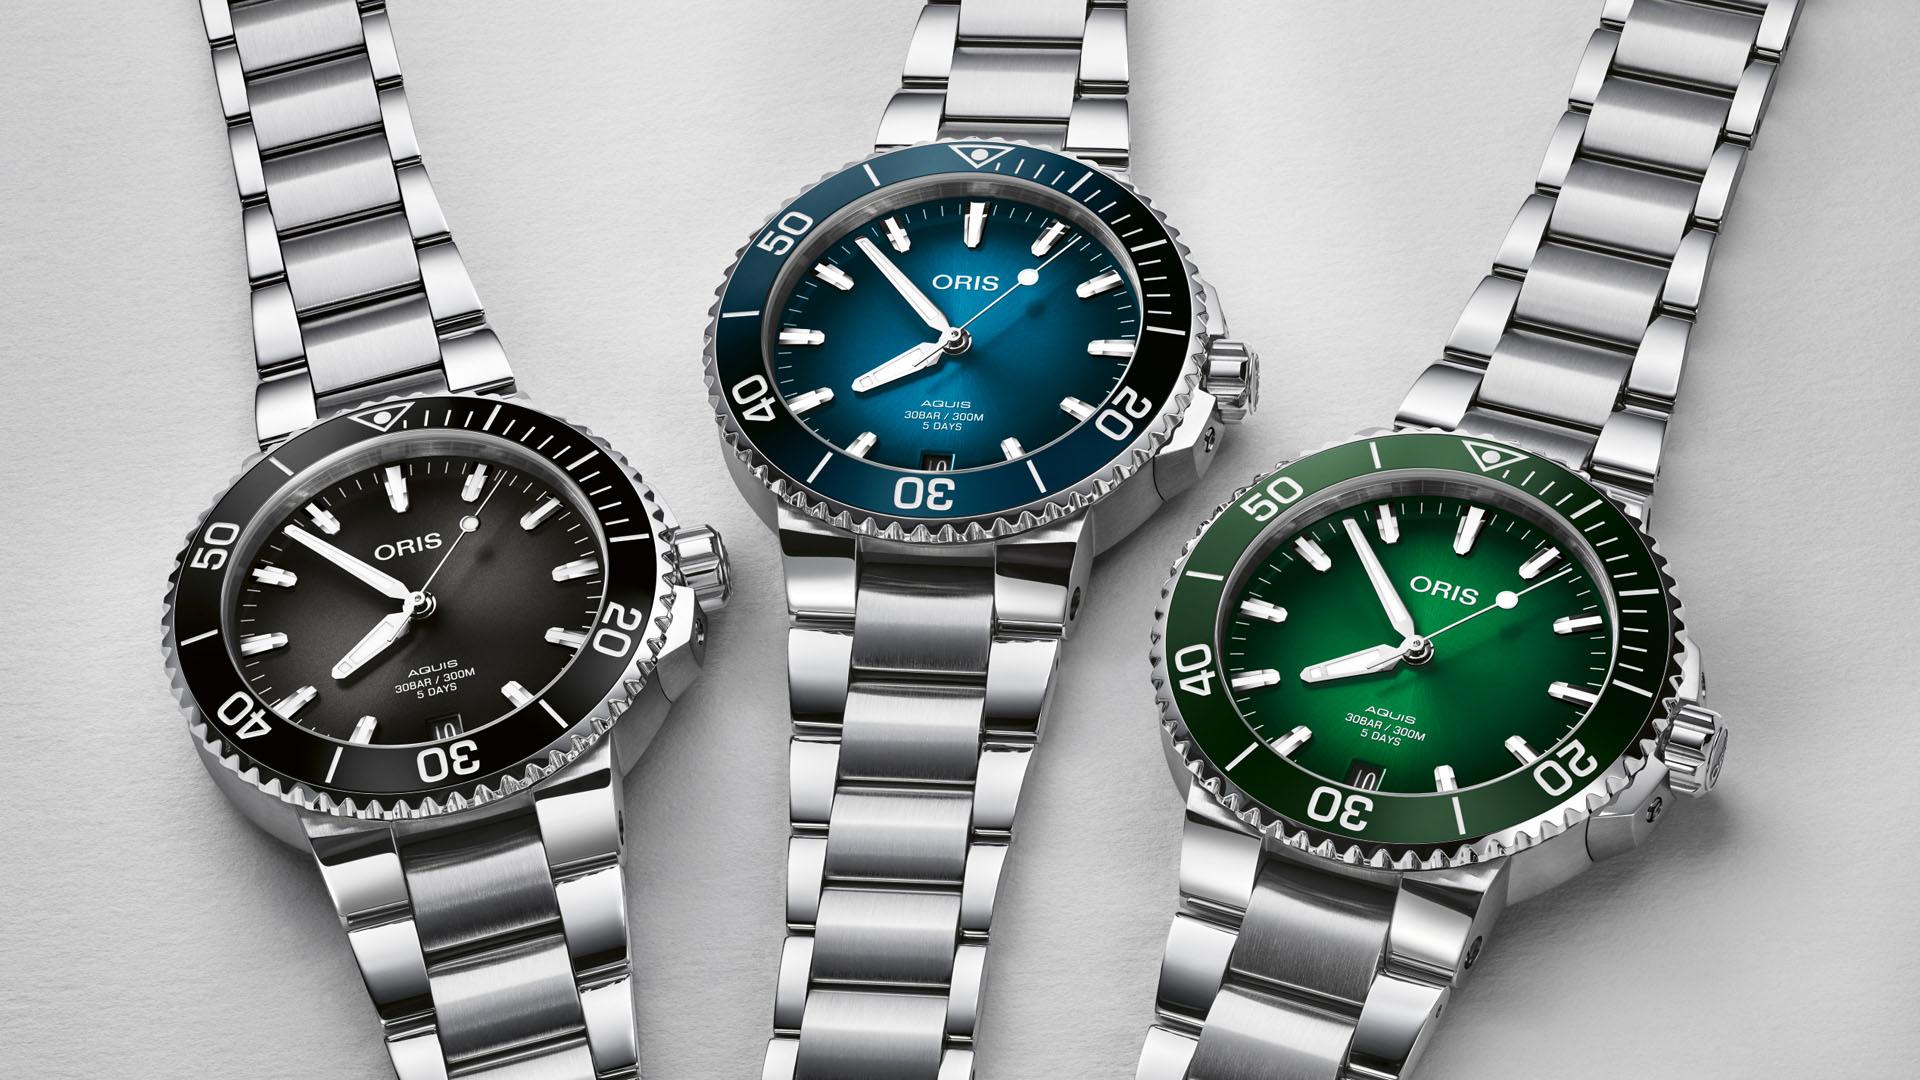 Oris creates Aquis Date Calibre 400 - an avant-garde diver's watch